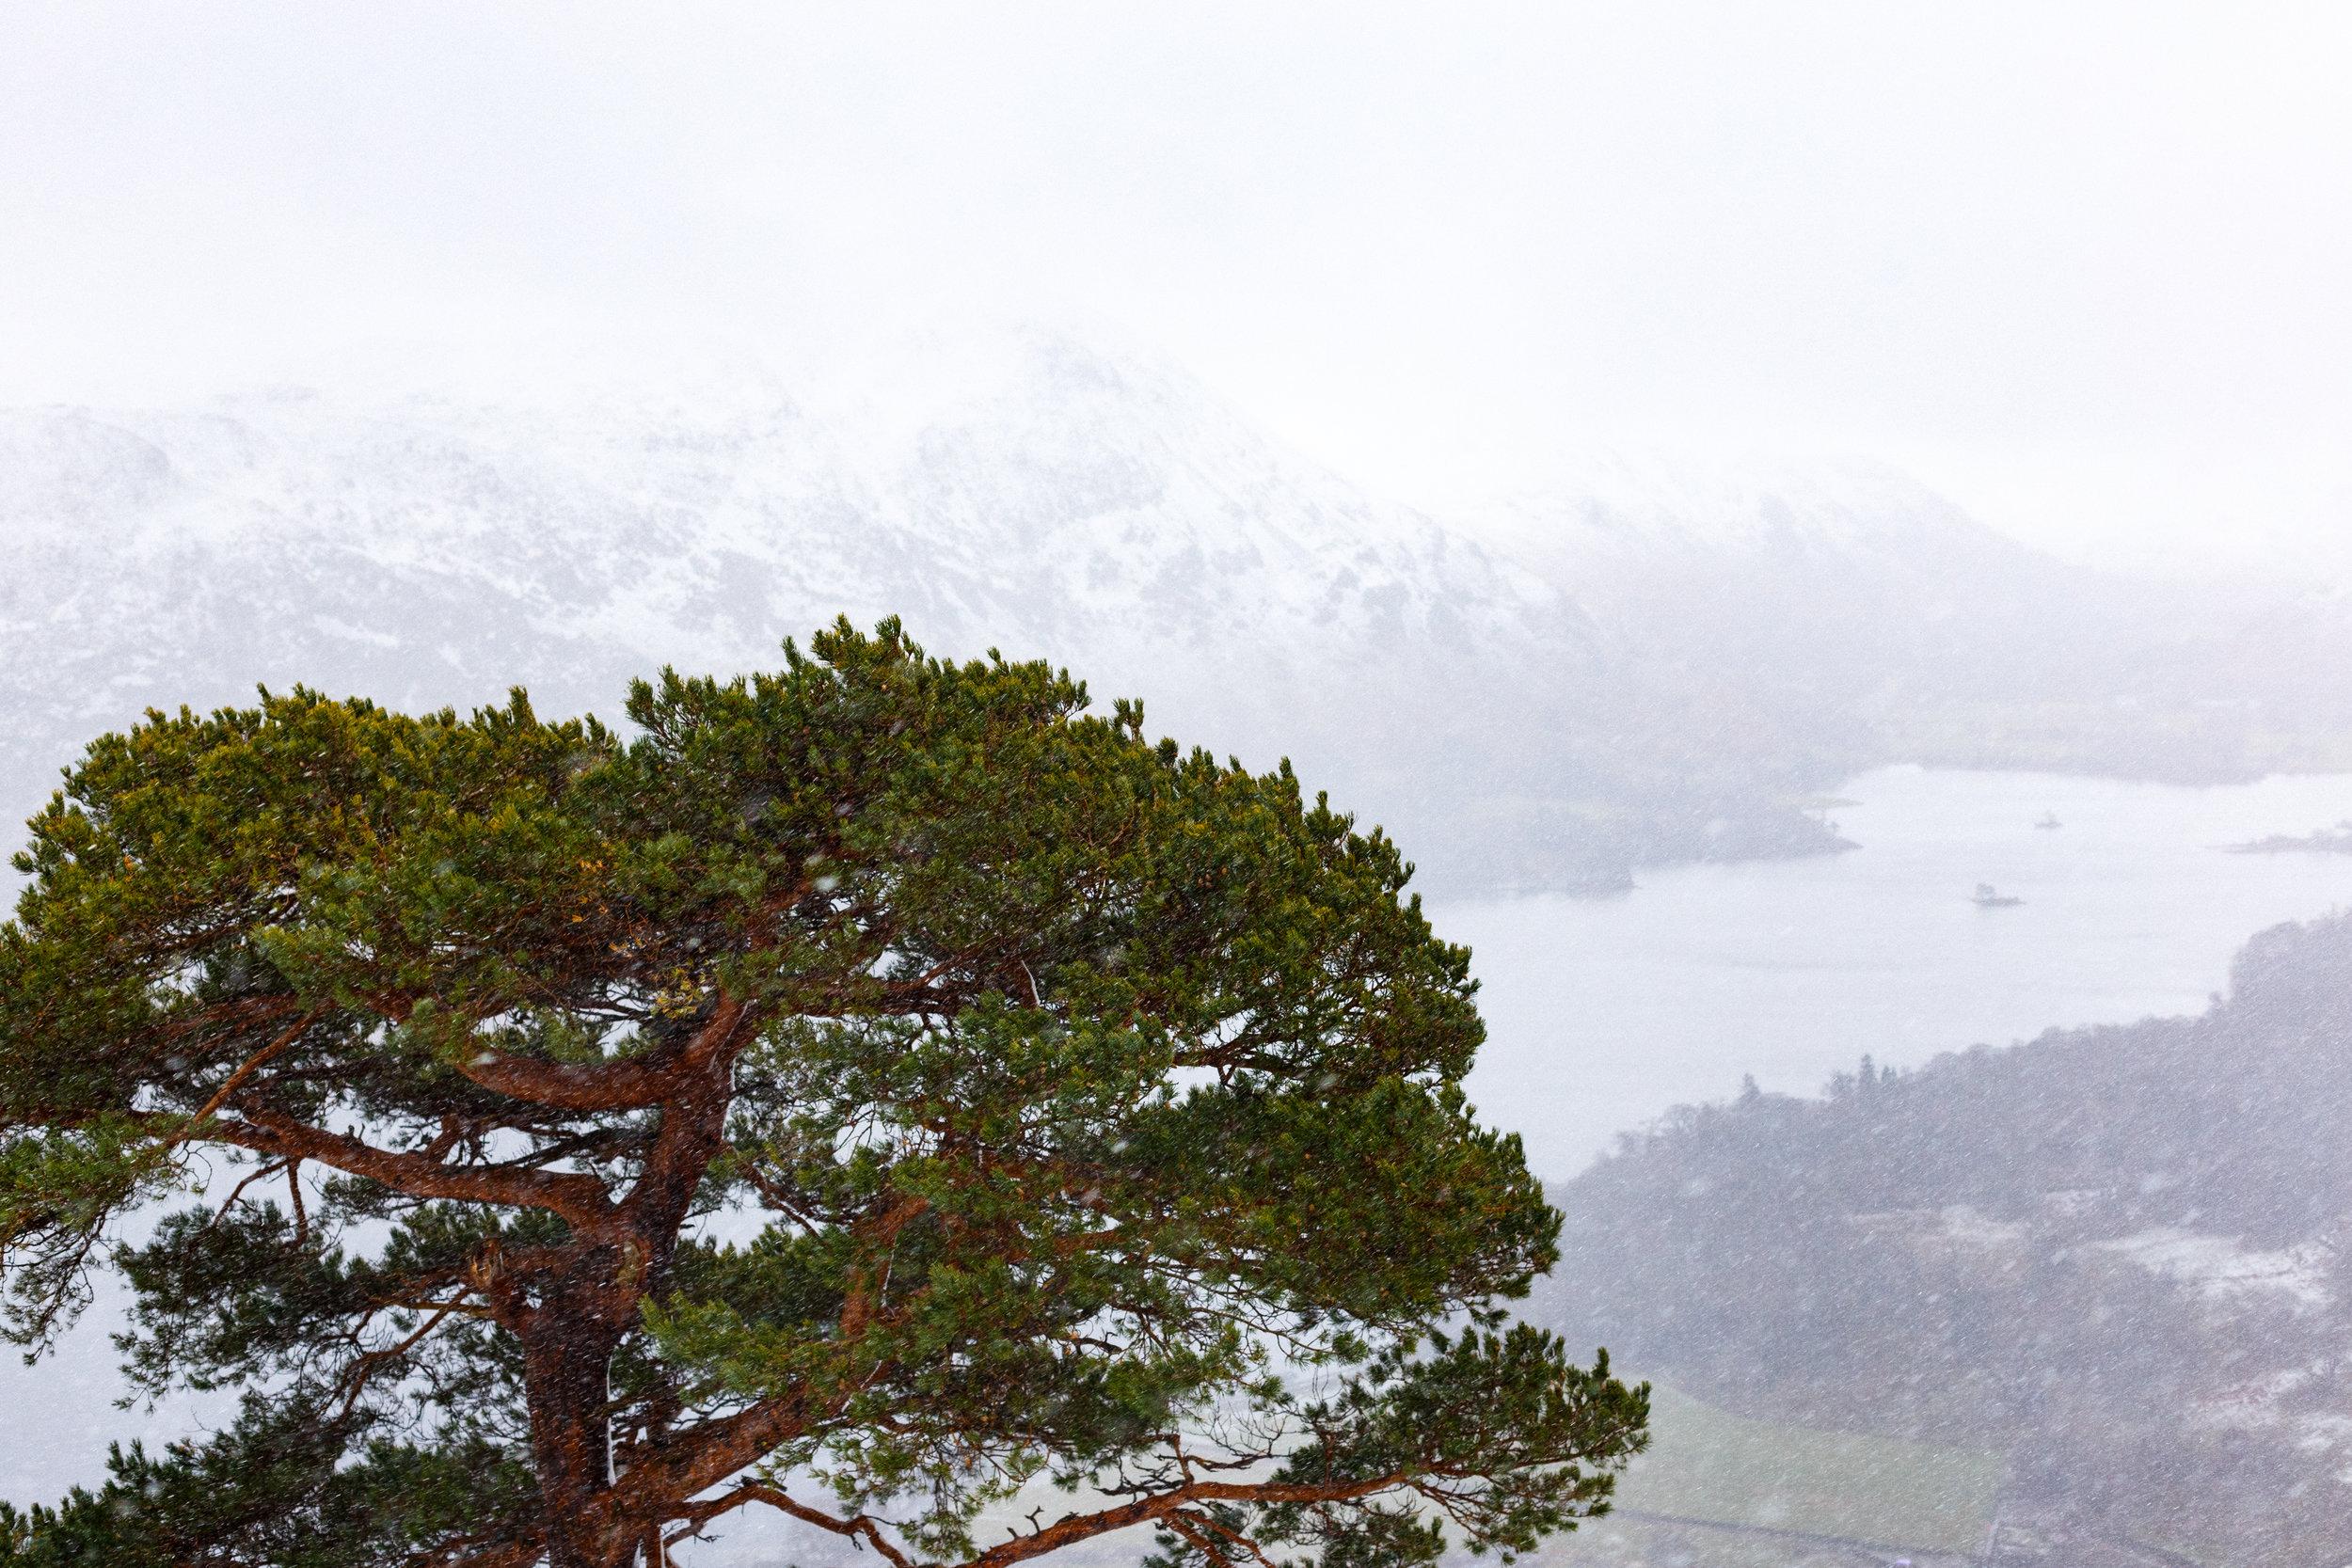 The Glencoyne Pine in Brutal conditions